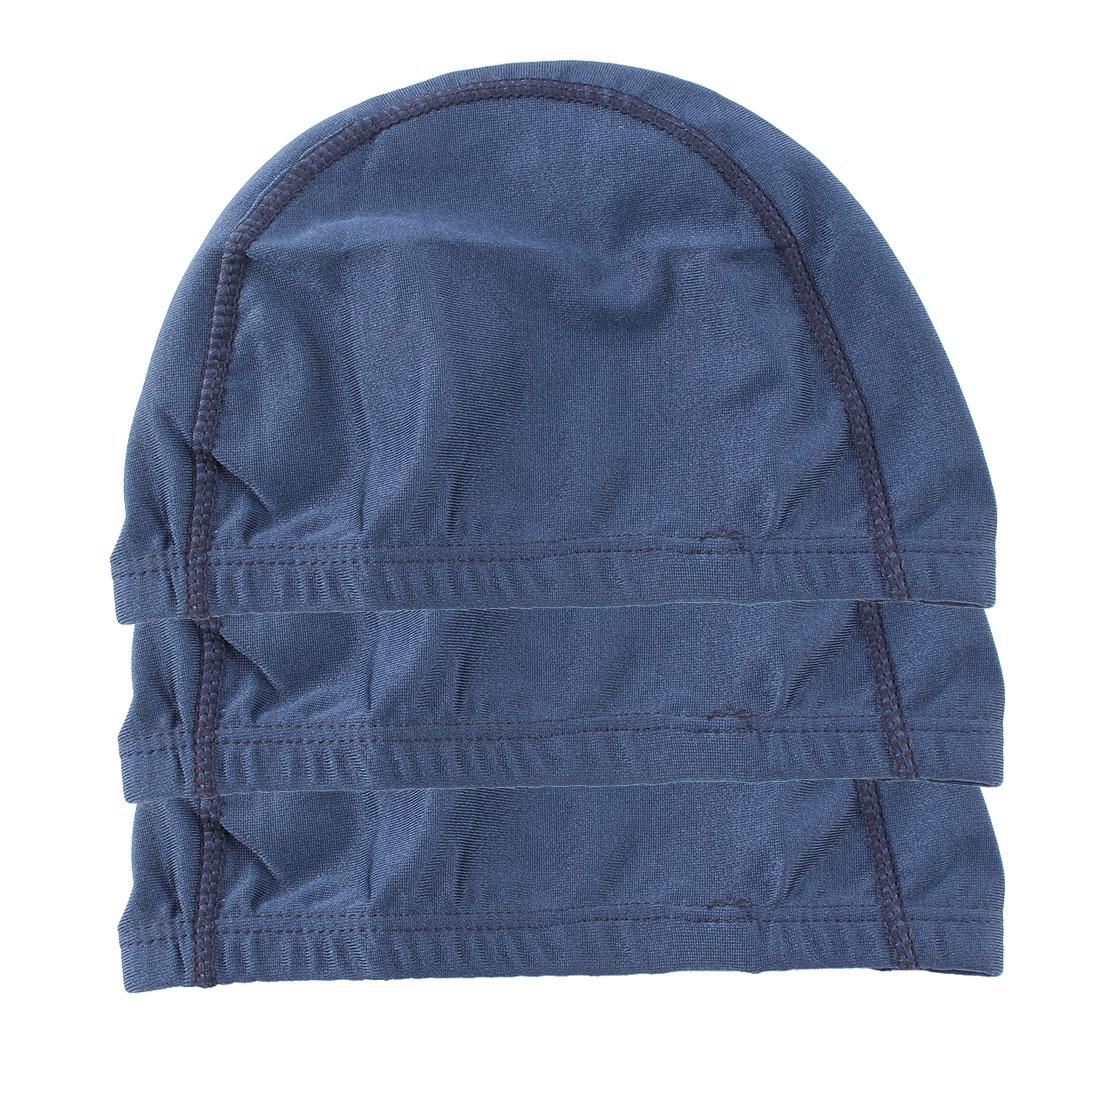 Sport Swimming Elastic Fiber Dome Shape Stretchy Headband Cap Dark Blue 3pcs